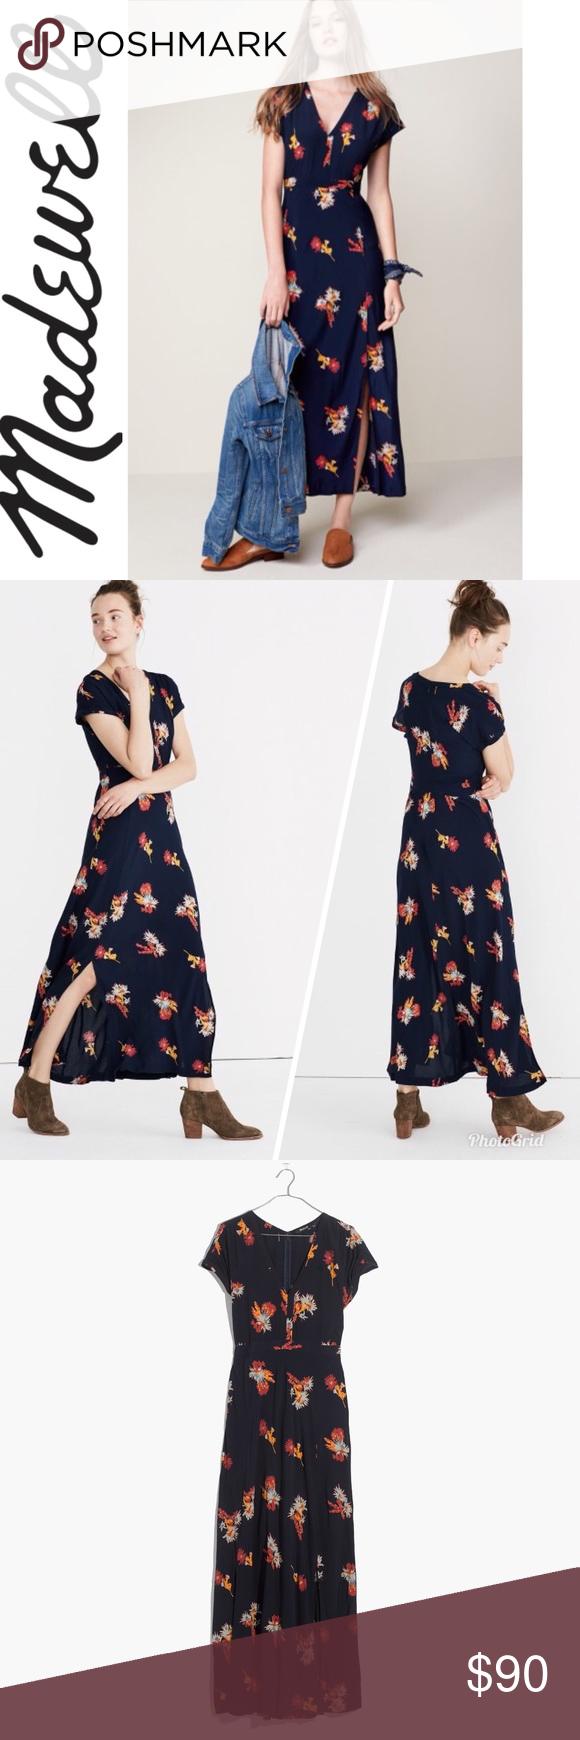 e4206805cb7 Cactus Flower Print Maxi Dress New with tag